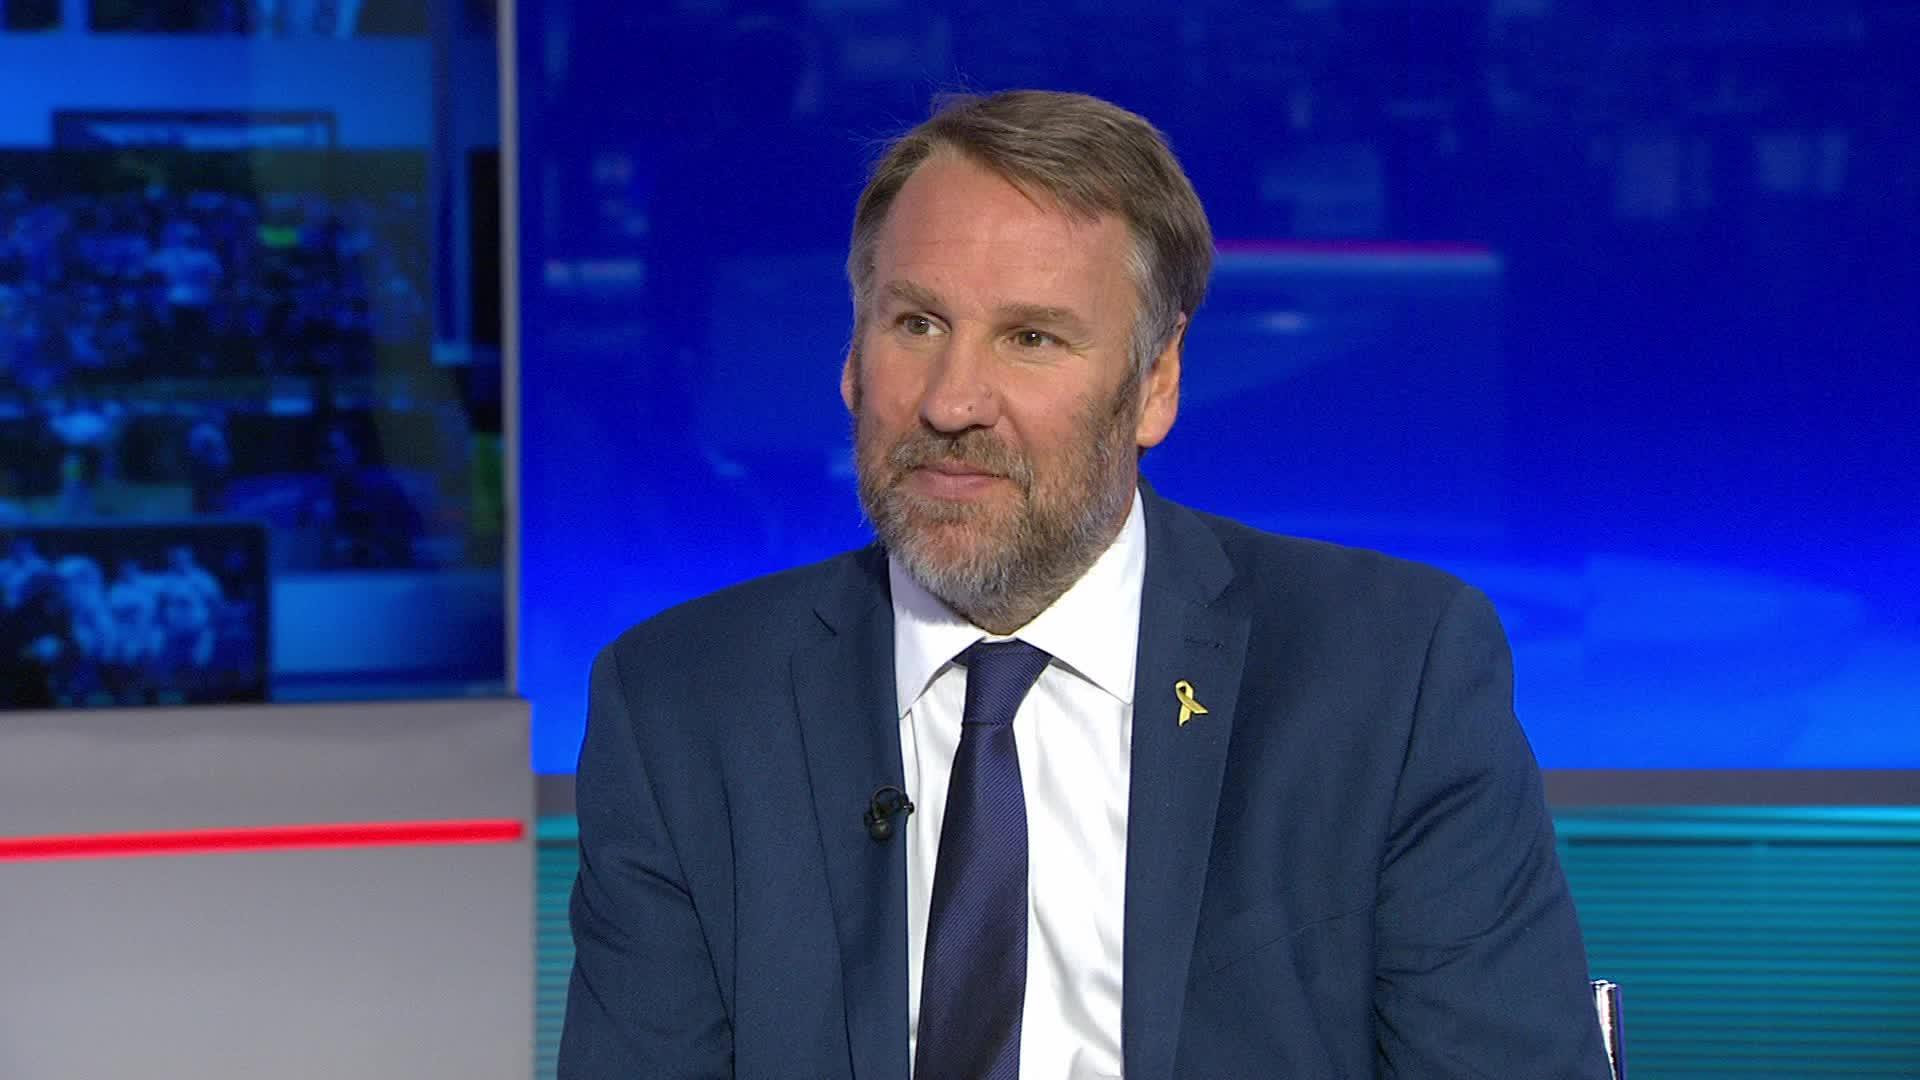 Paul Merson on Sky Sports